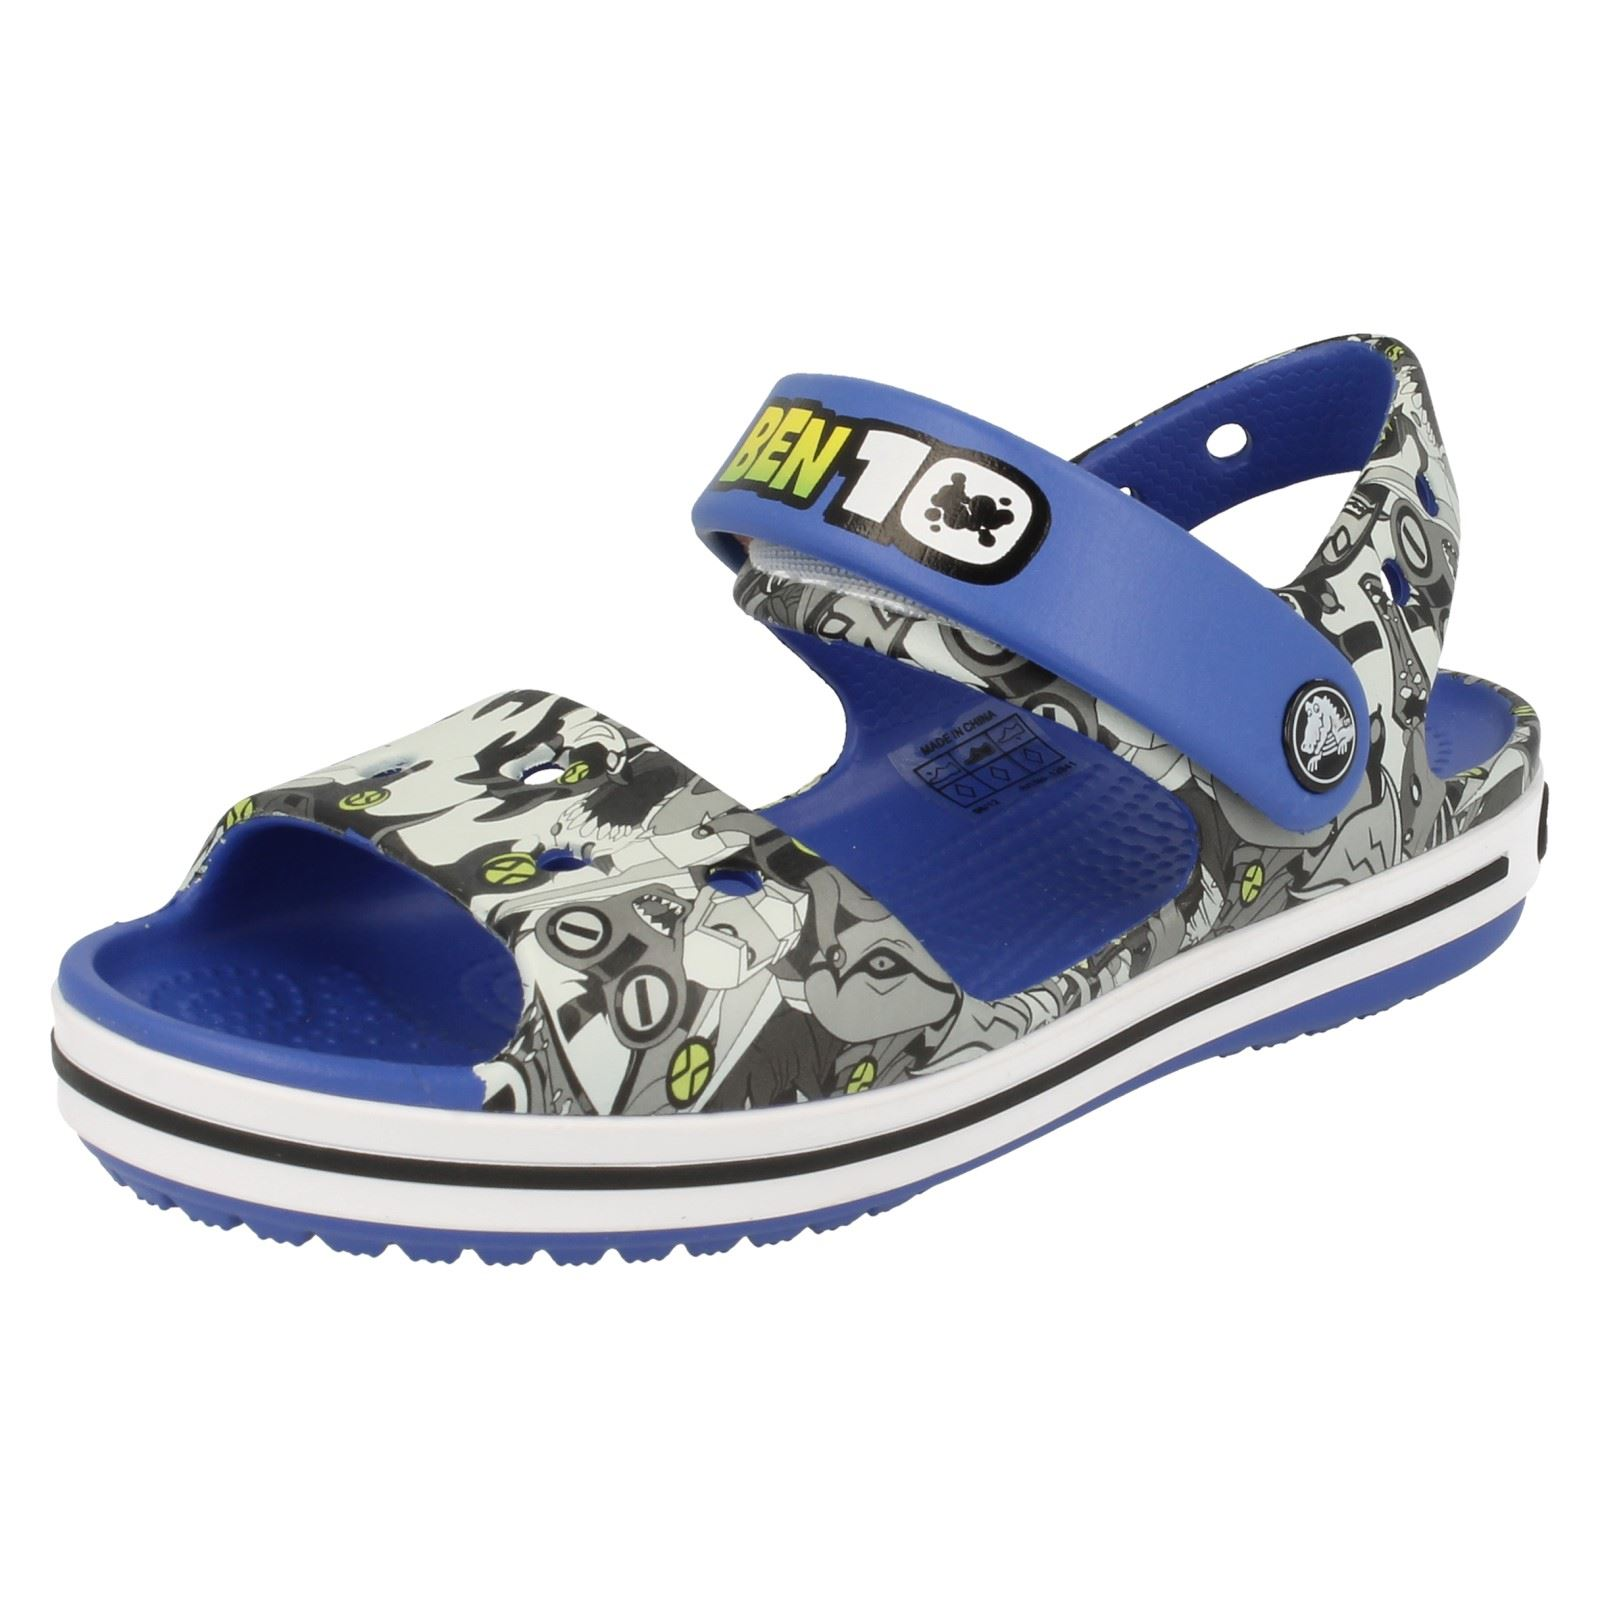 8b5c94c6a92b Crocs Boys Sandals - Crocband Sandal K Ben 10